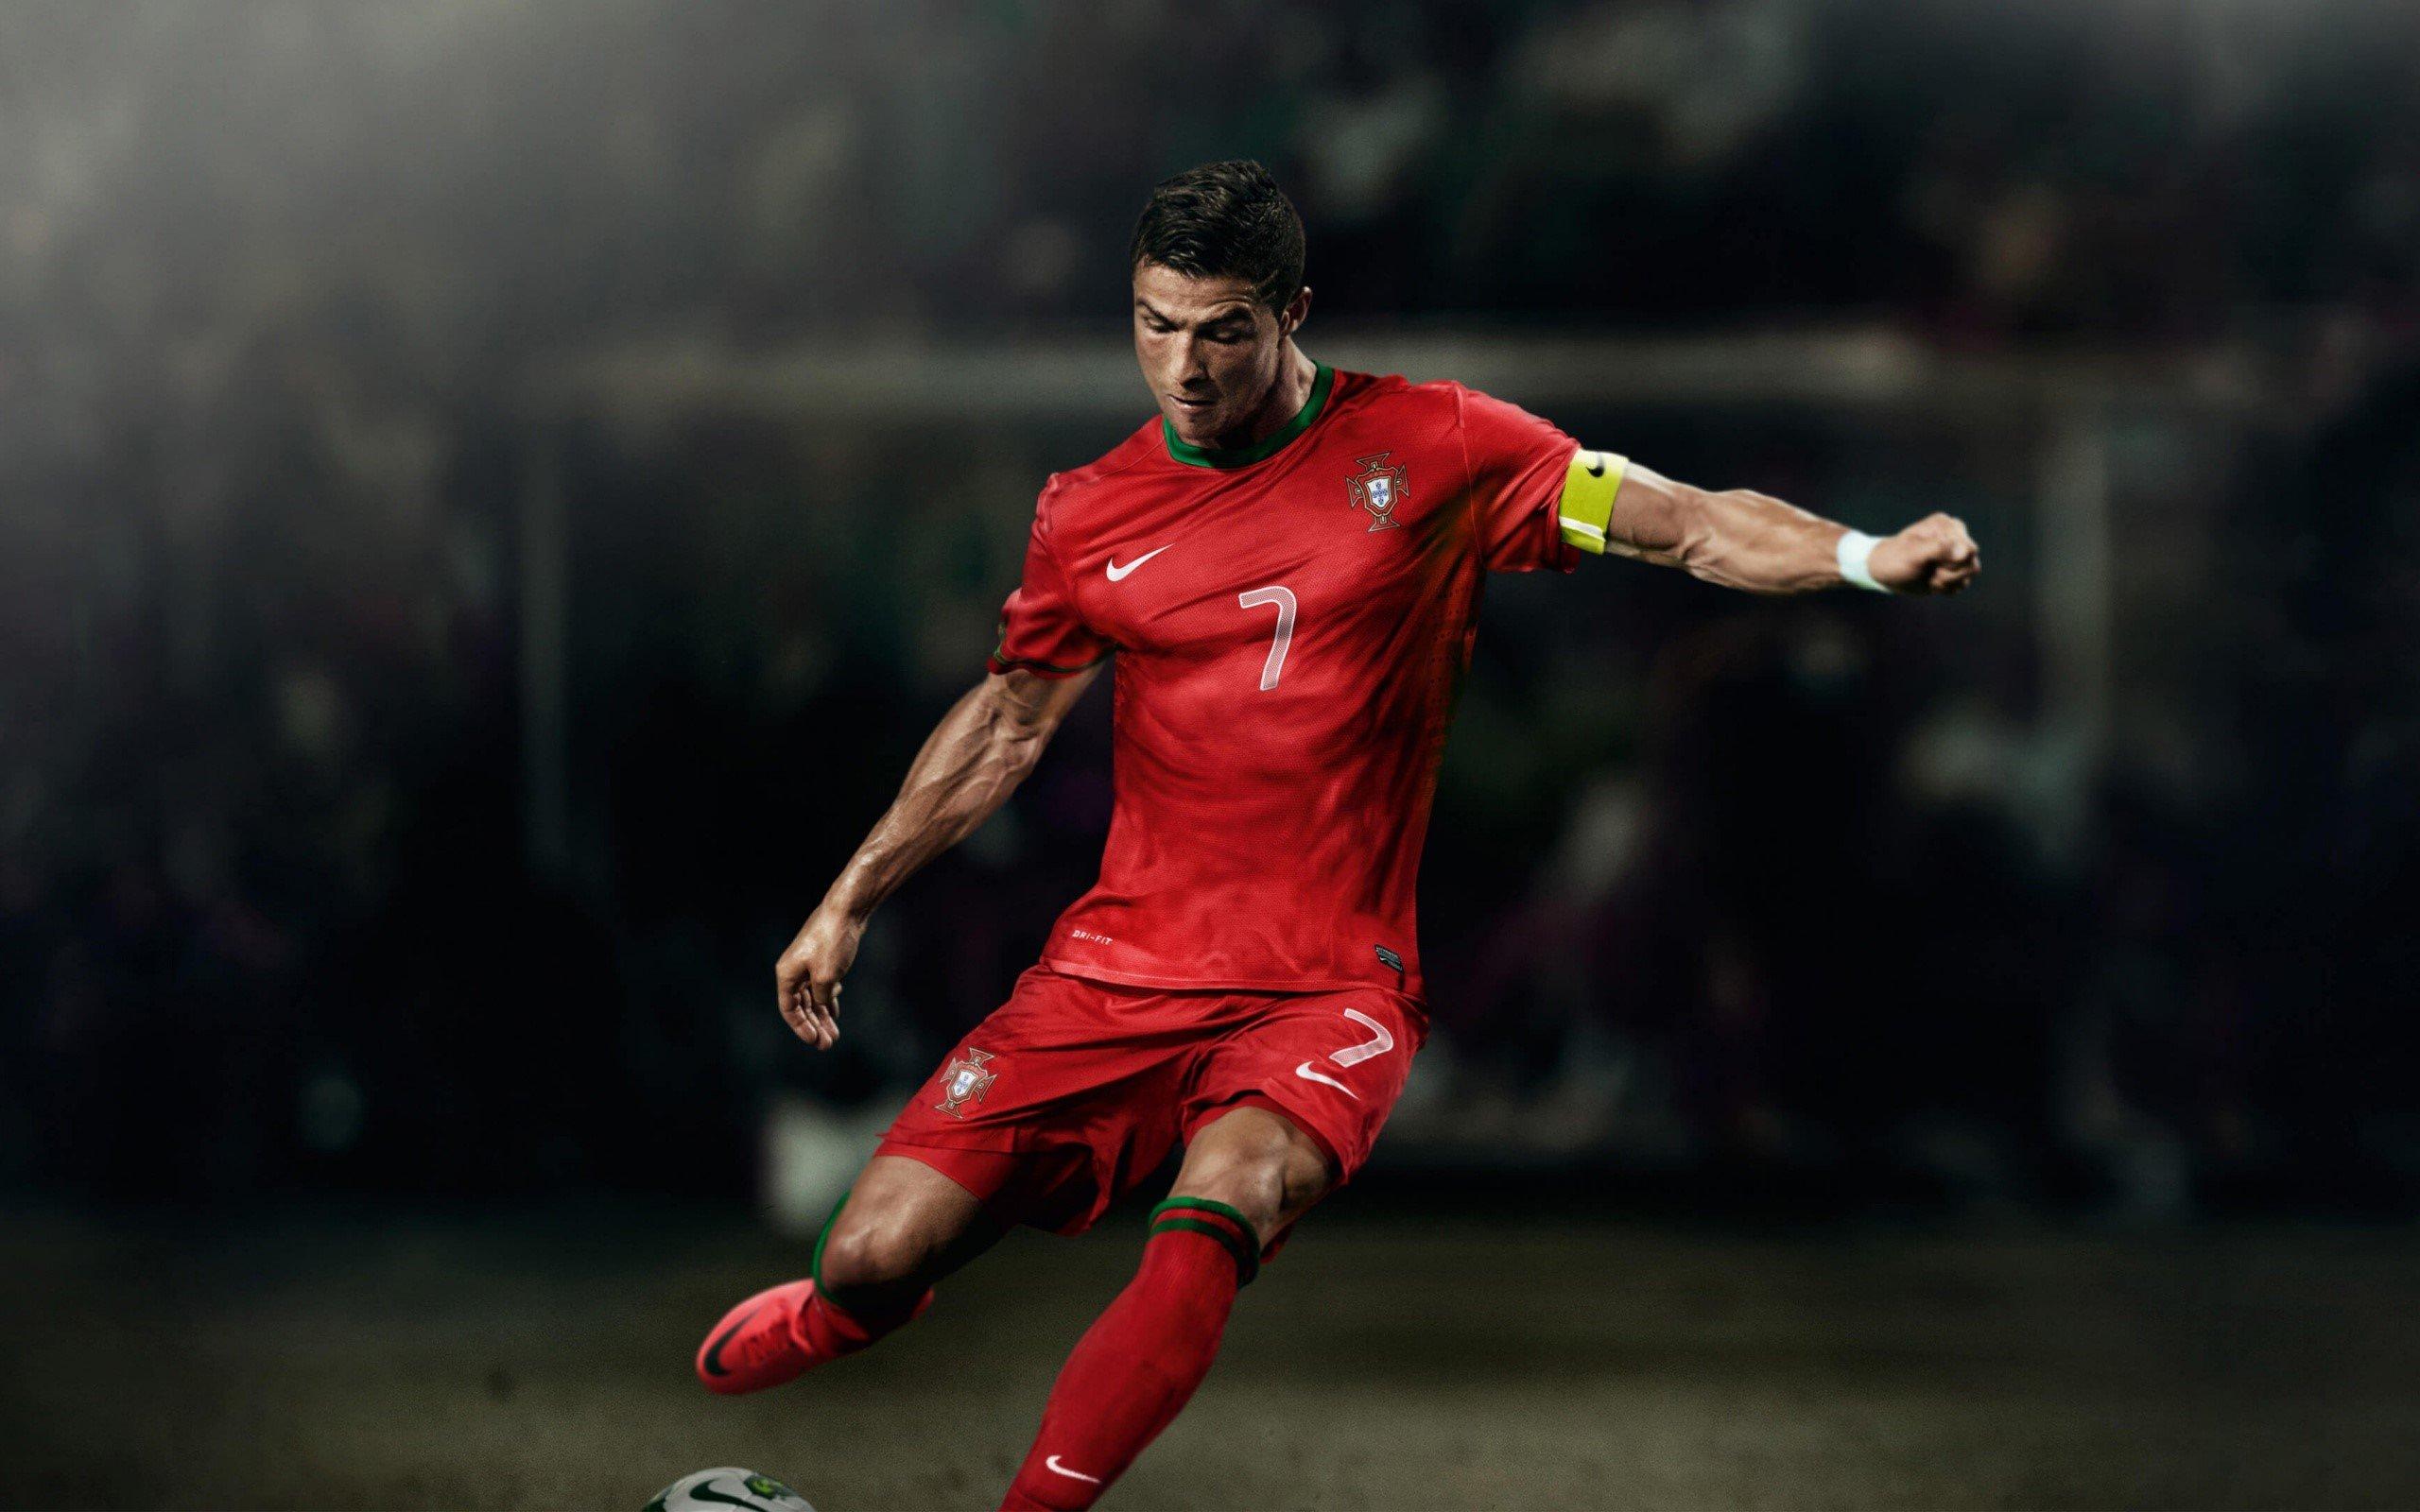 Fondos de pantalla de futbolistas famosos